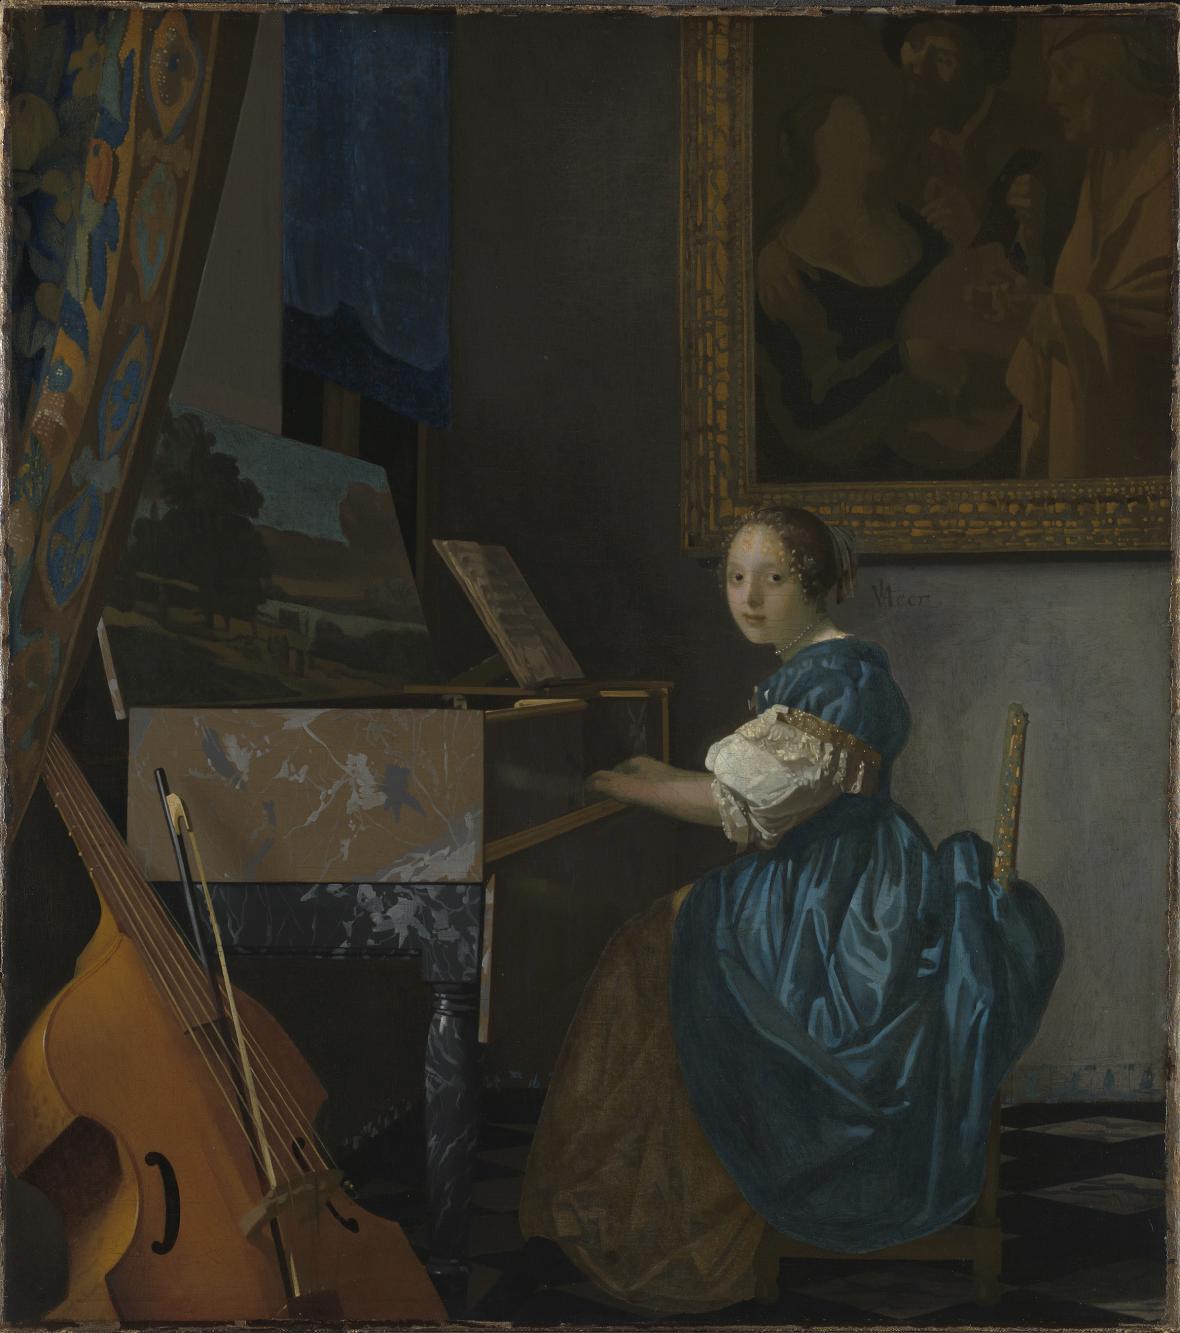 Johannes Vermeer / Žena sedící u virginalu, kolem 1671-1674